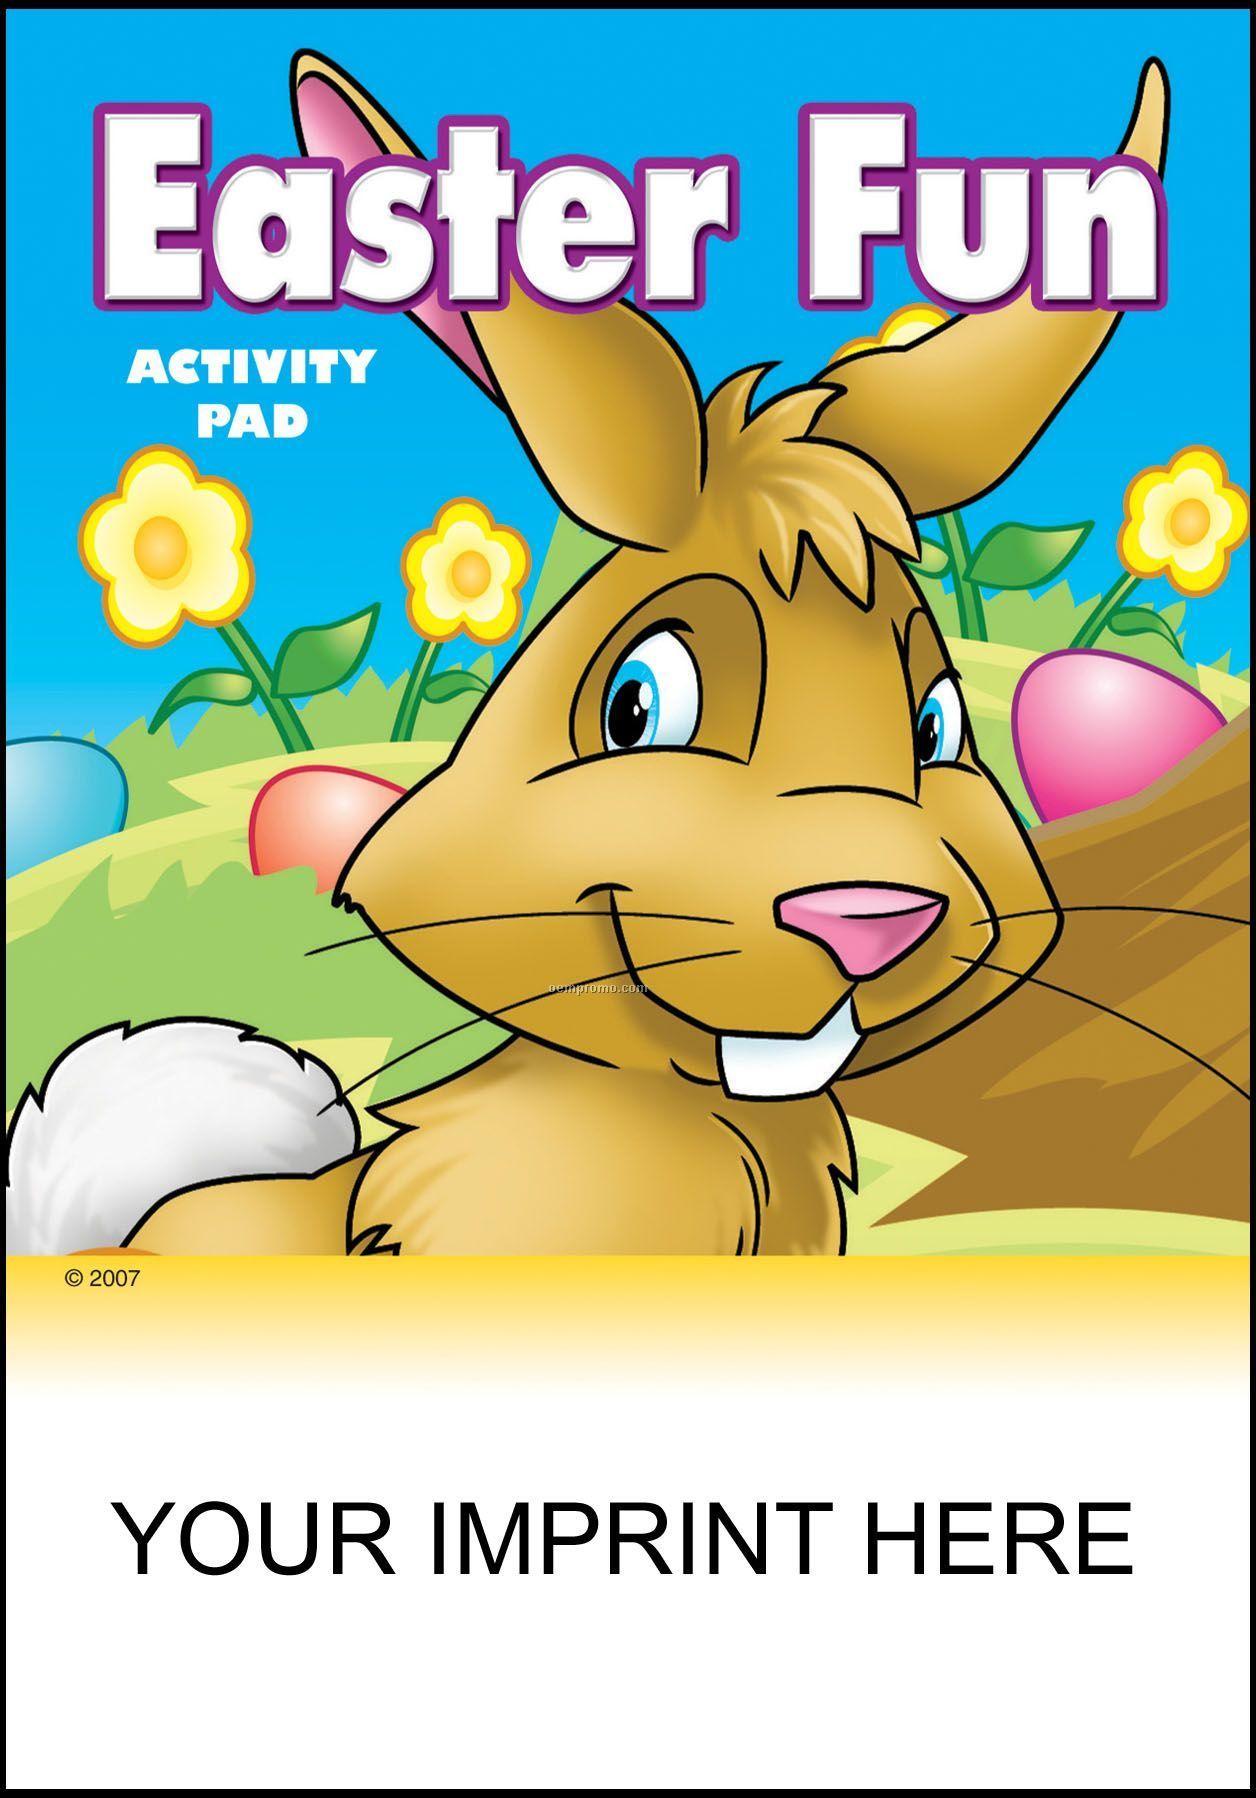 Easter Fun Activity Pad